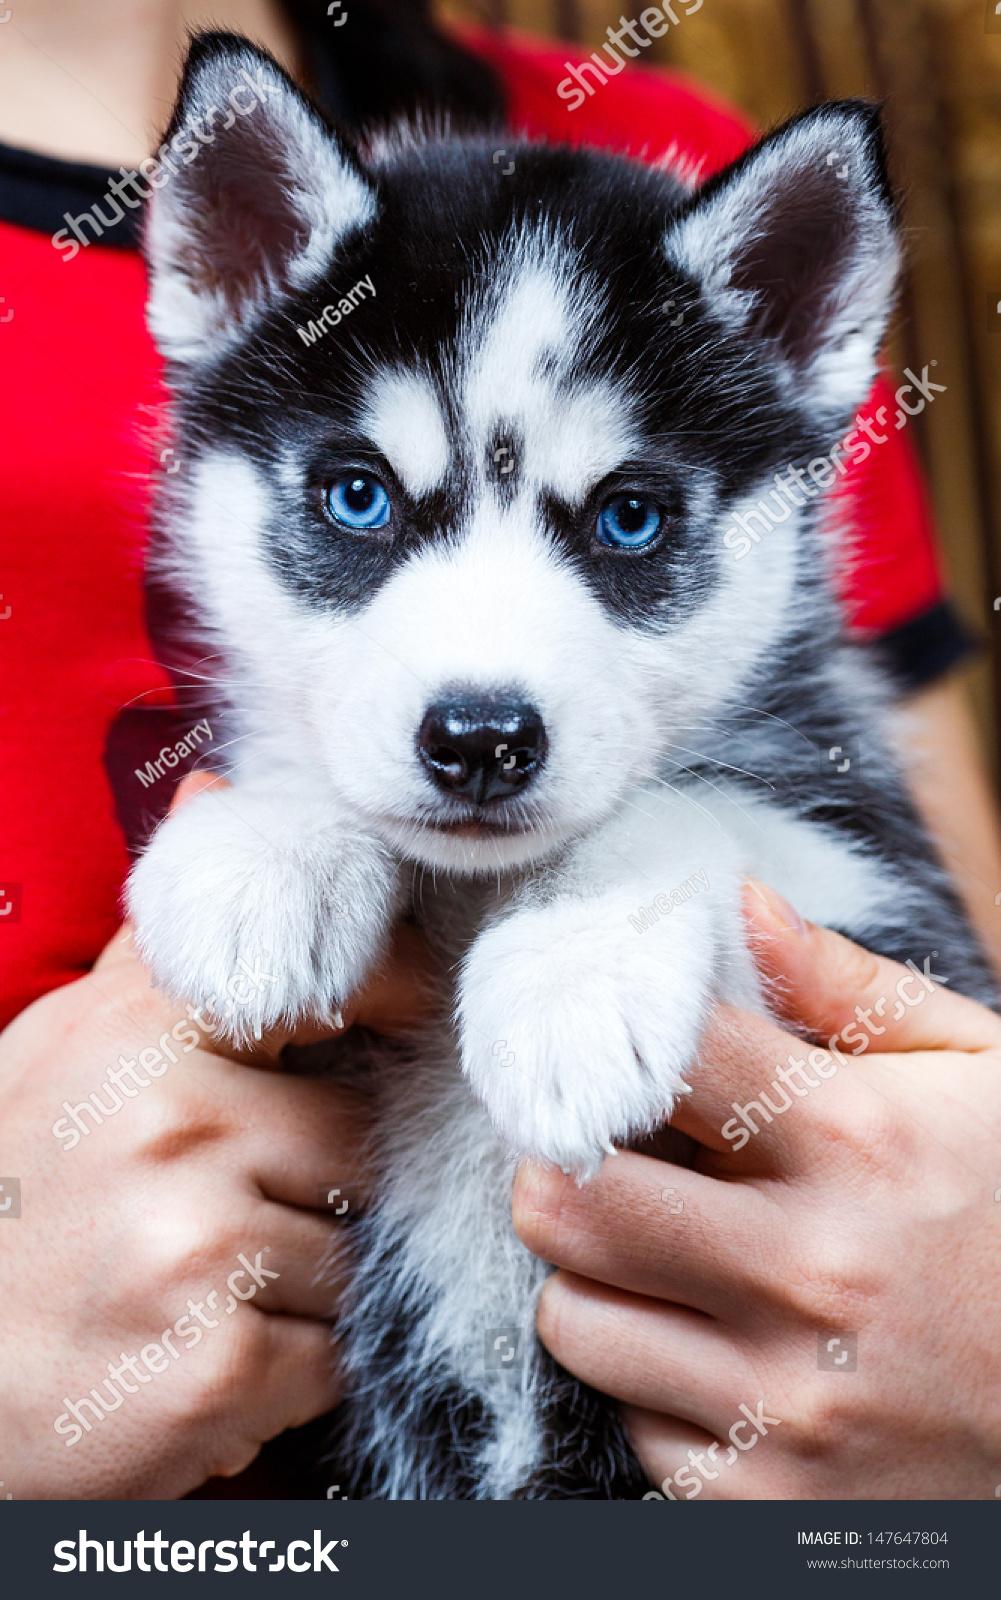 Siberian Husky Puppy Blue Eyes Foto De Stock Editar Ahora 147647804